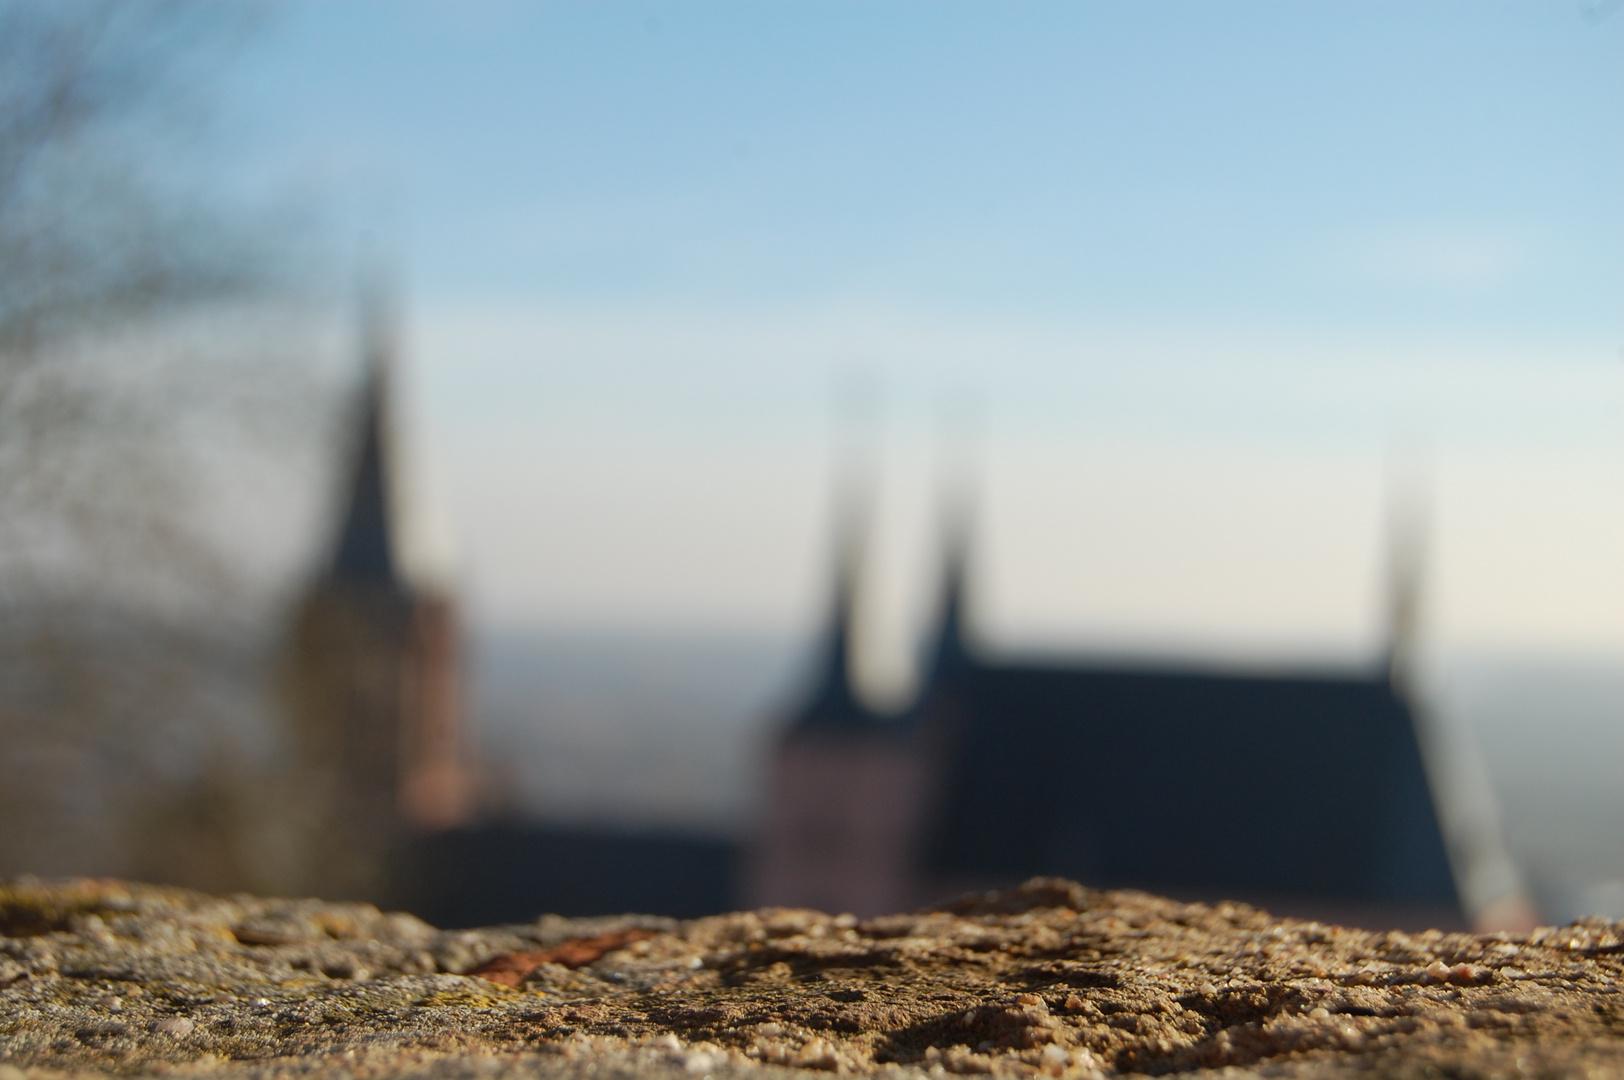 St. Katharinen Oppenheim II